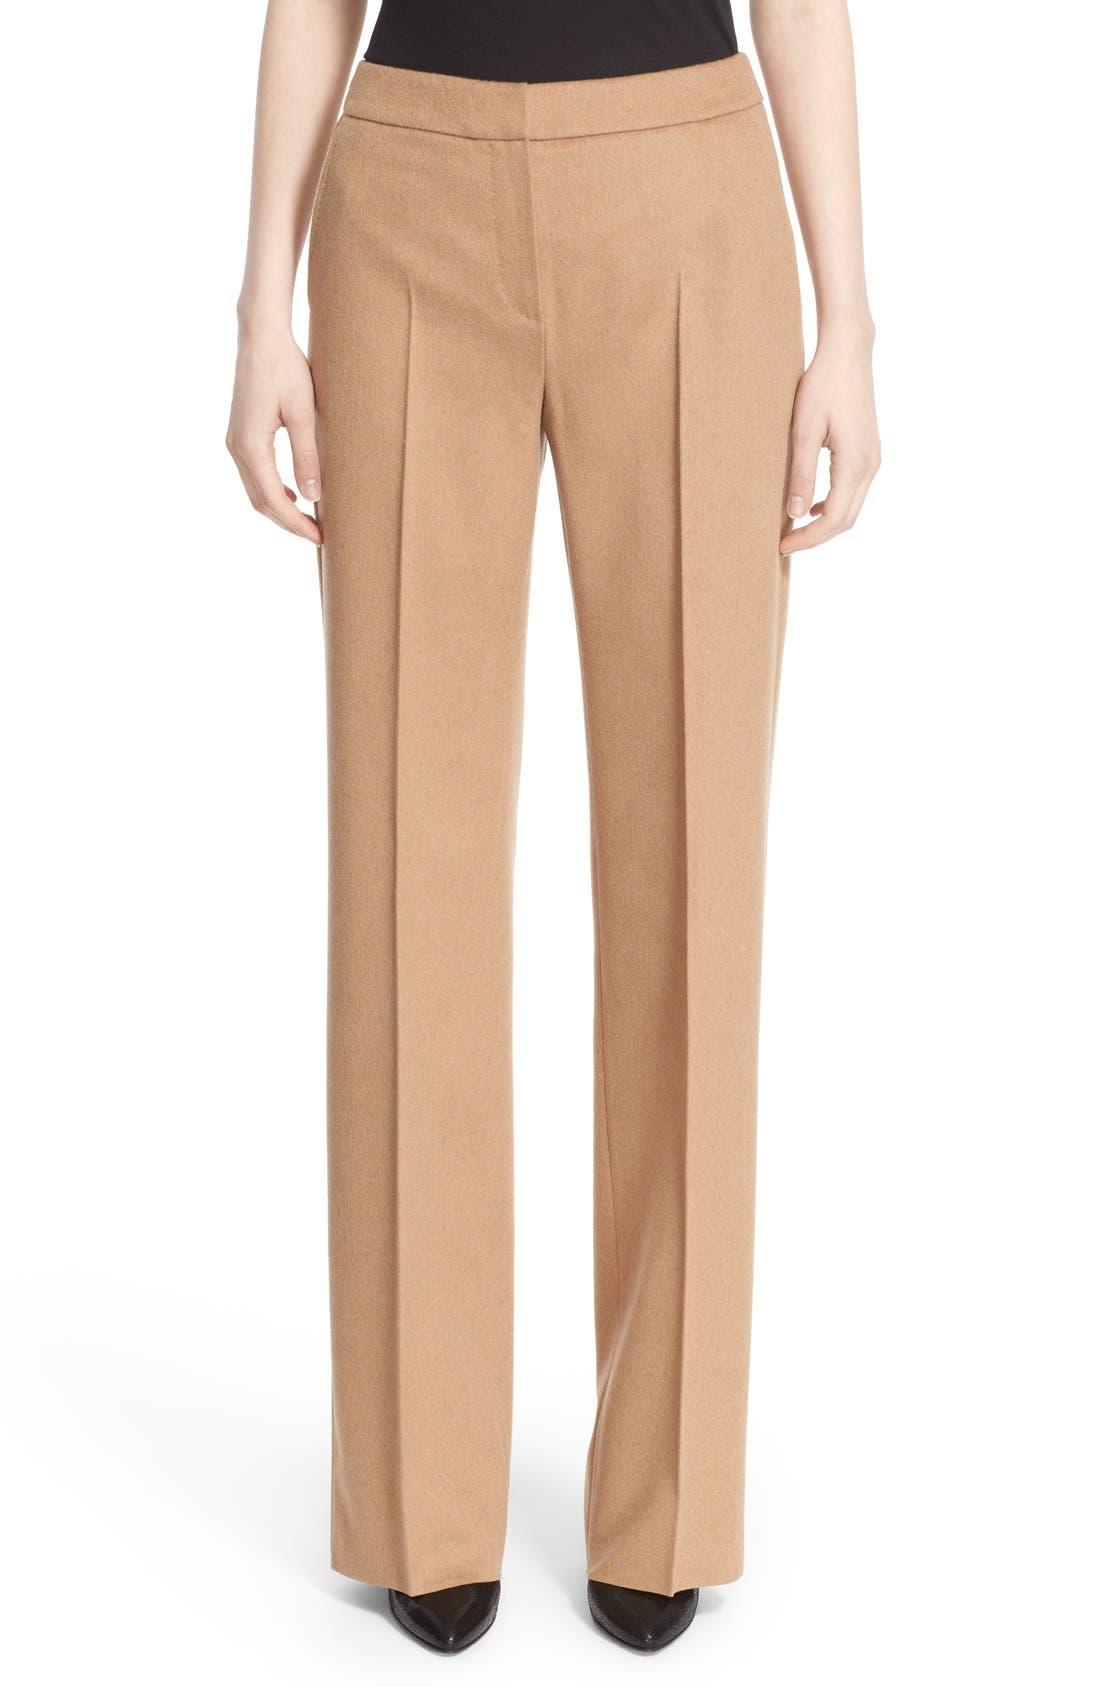 Max Mara 'Pescia' Camel Hair Pants